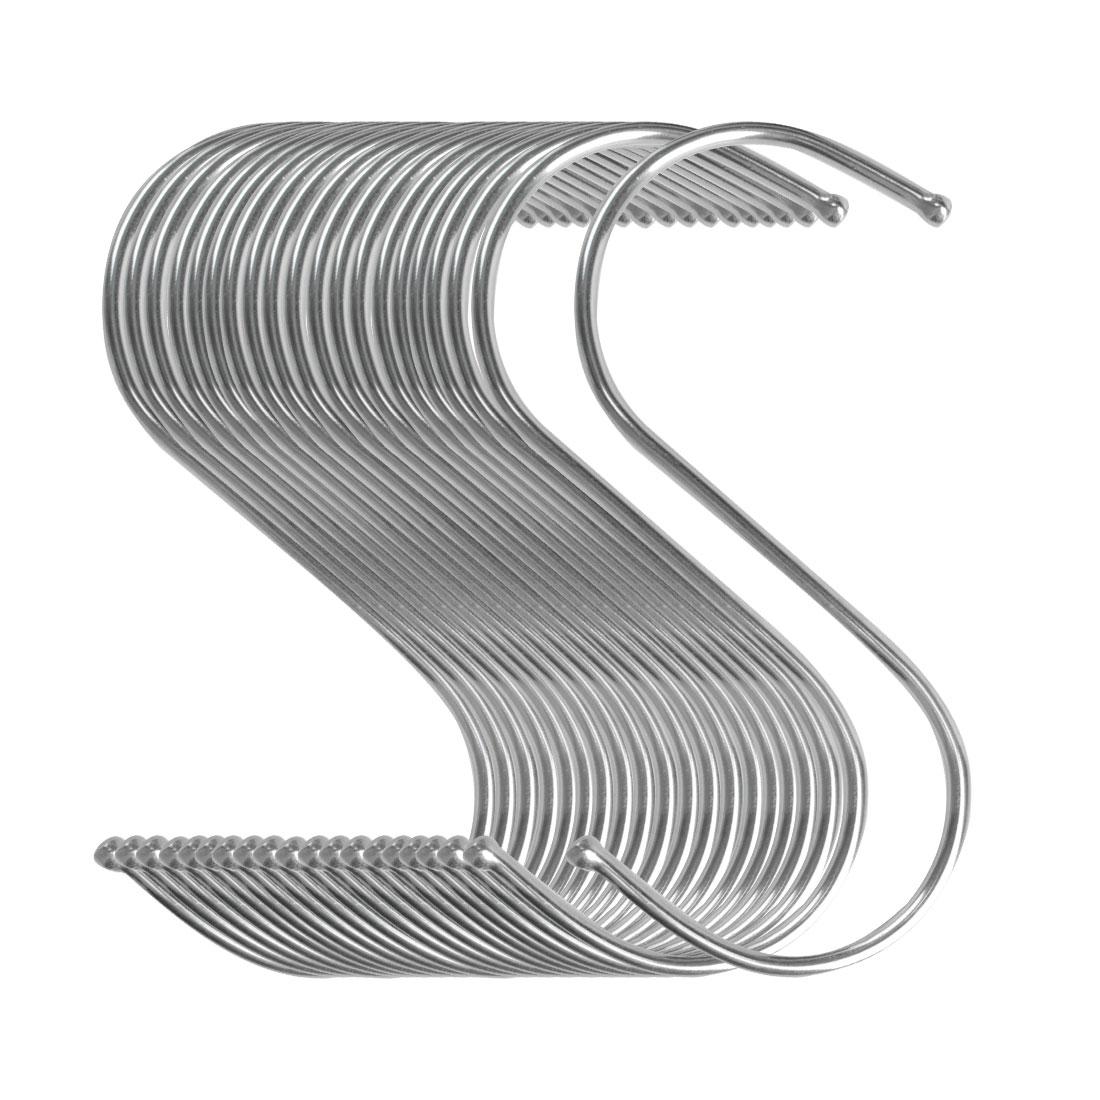 20pcs S Shaped Hook Stainless Steel for Kitchenware Hat Pot Utensil Holder